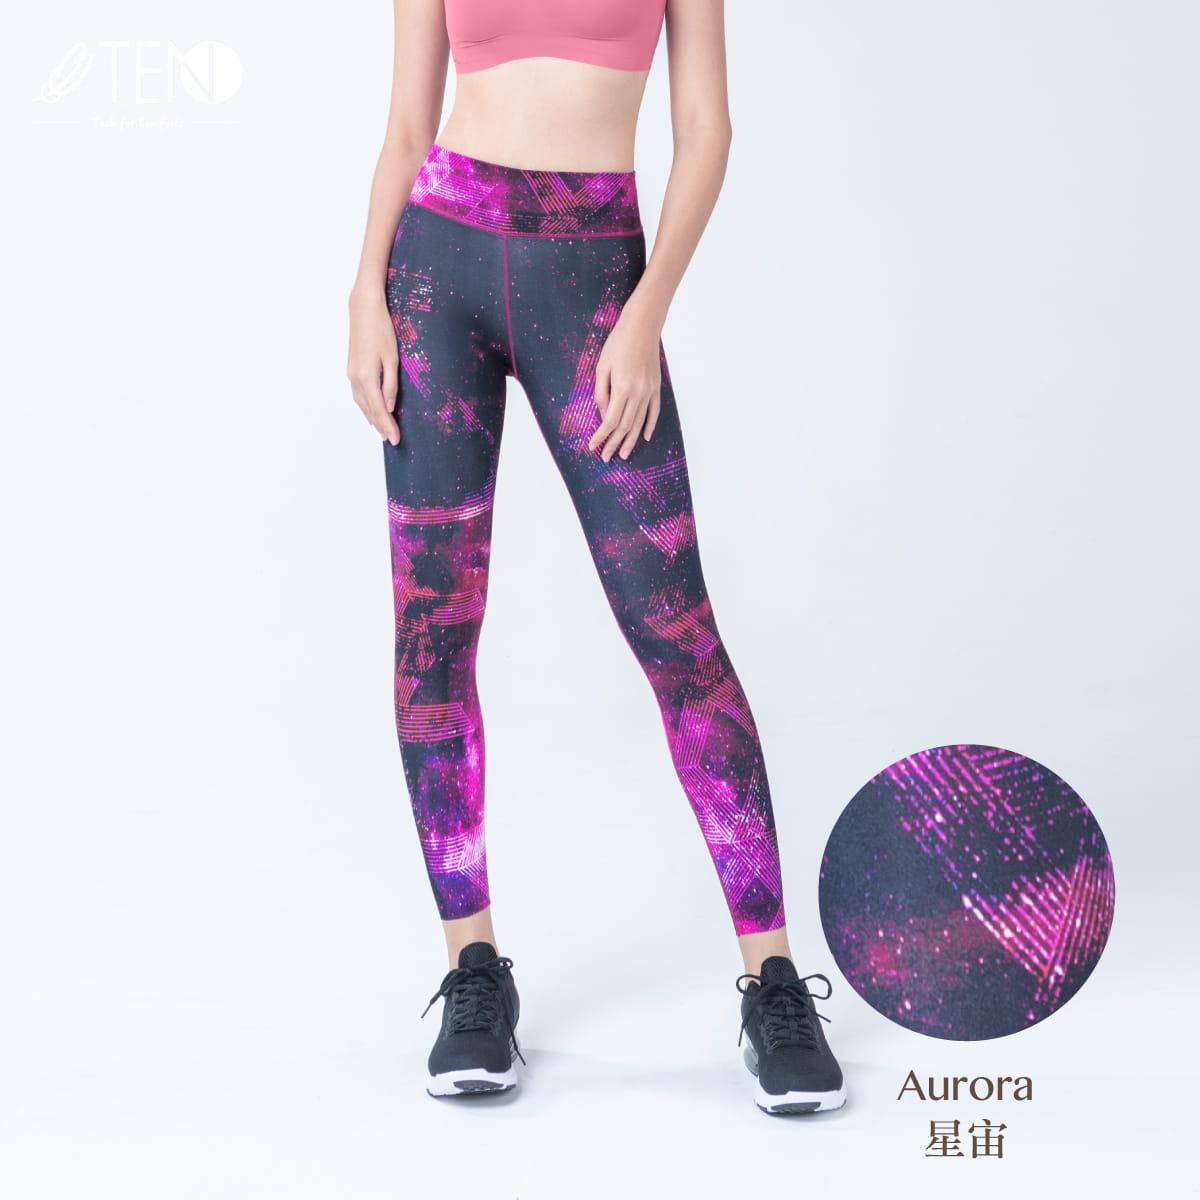 TENO超輕量運動休閒花花褲-設計師限量款 1